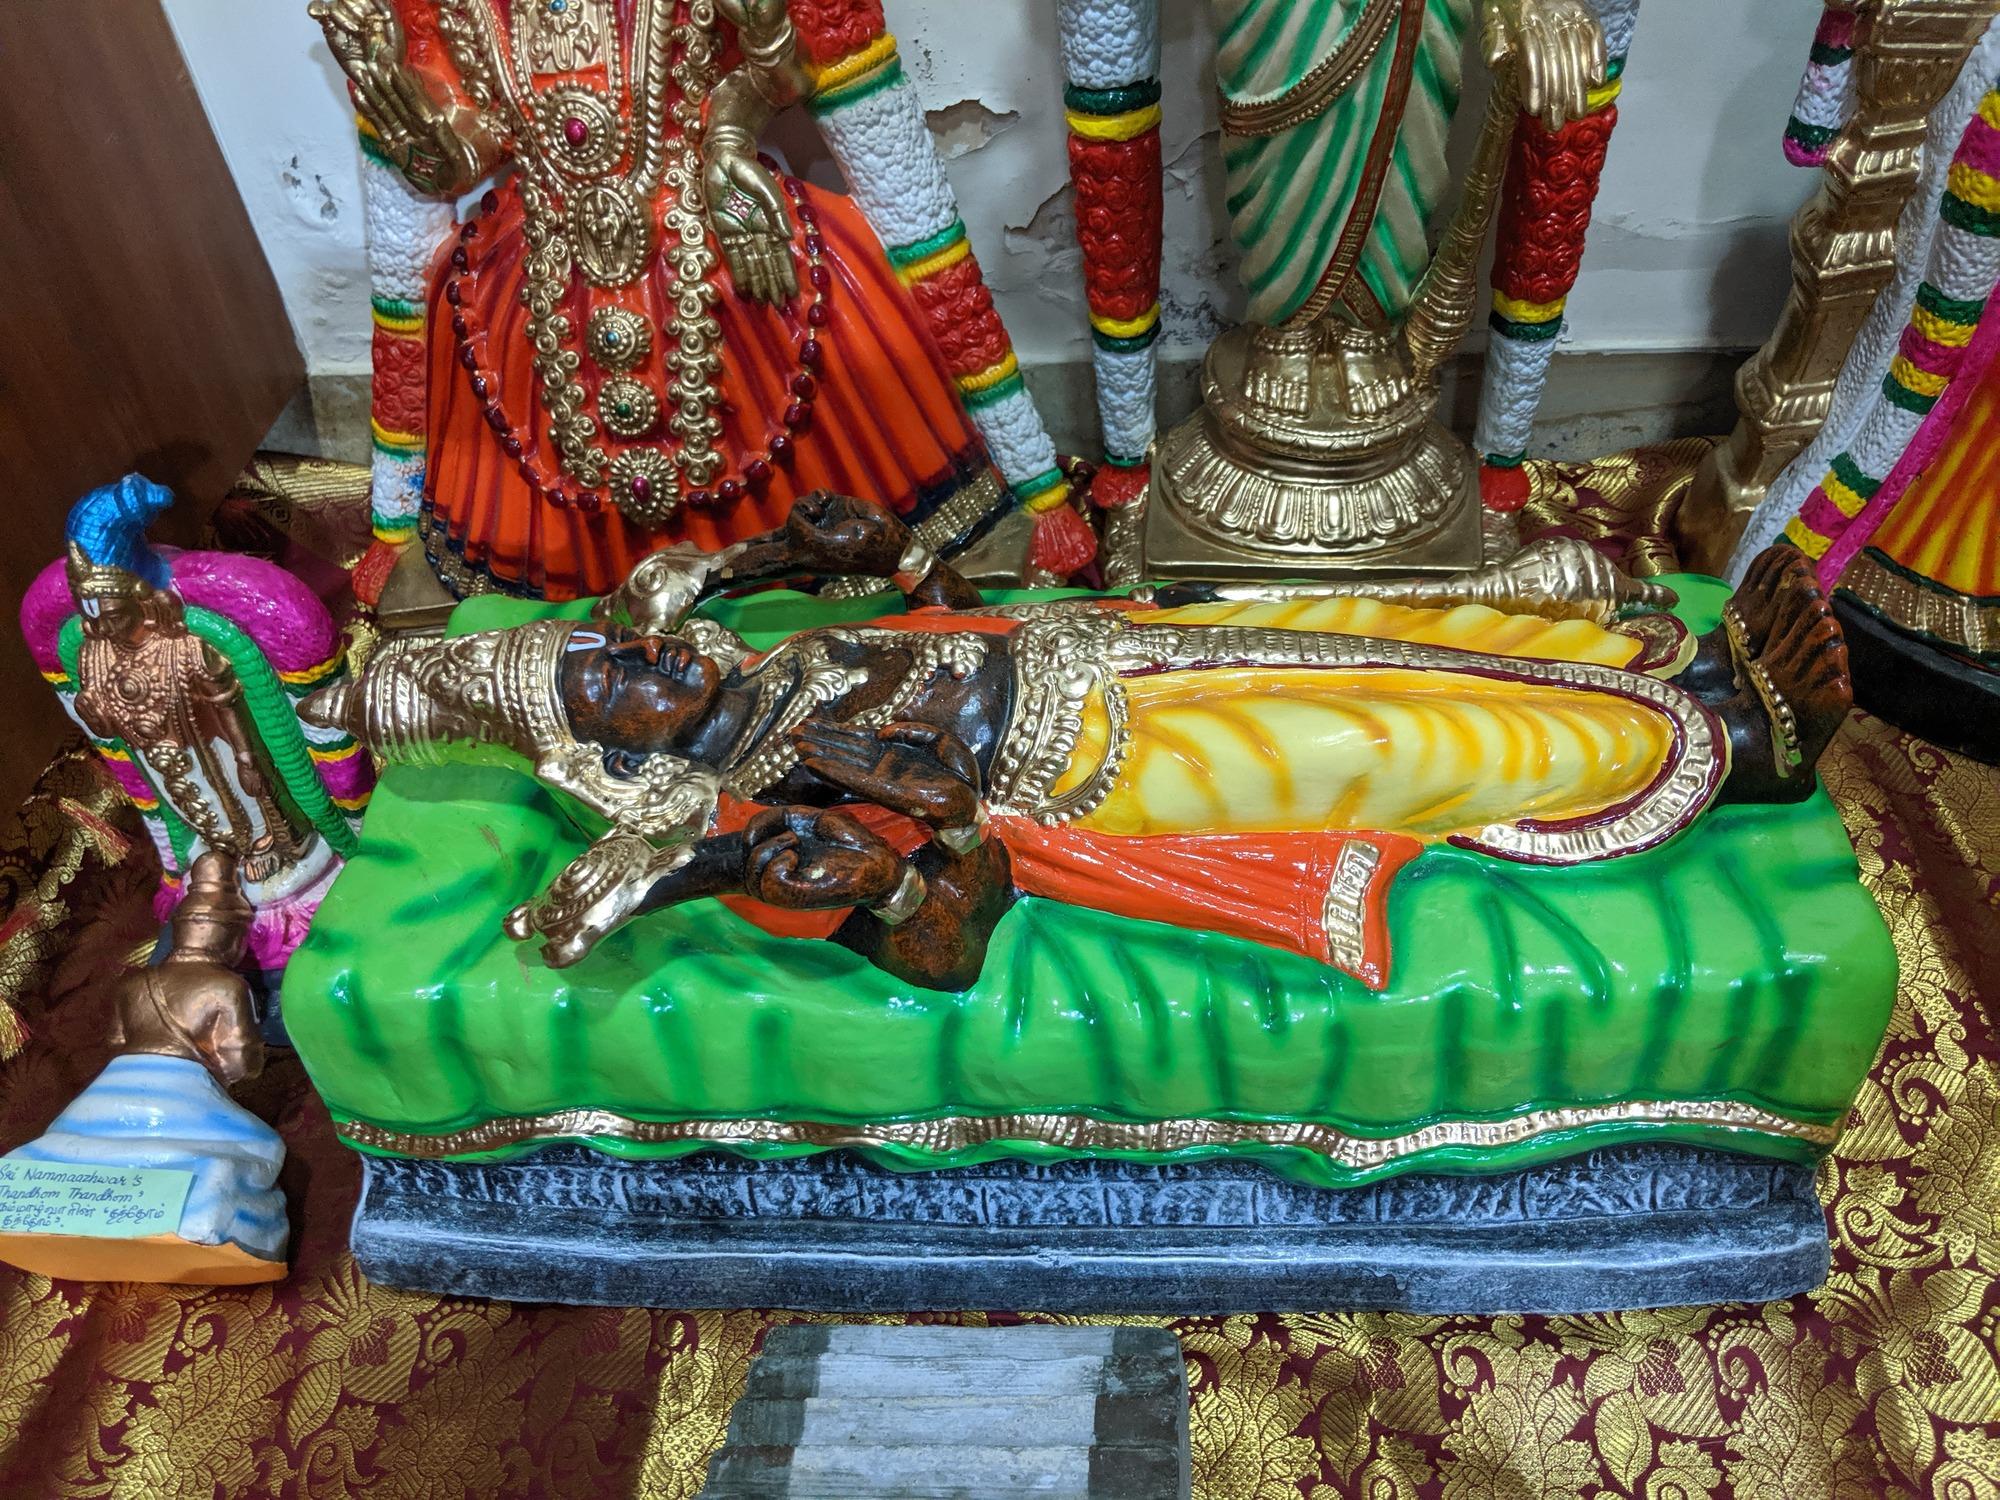 Kanchi Sri Athi Varadhar - காஞ்சி திரு அத்தி வரதர்